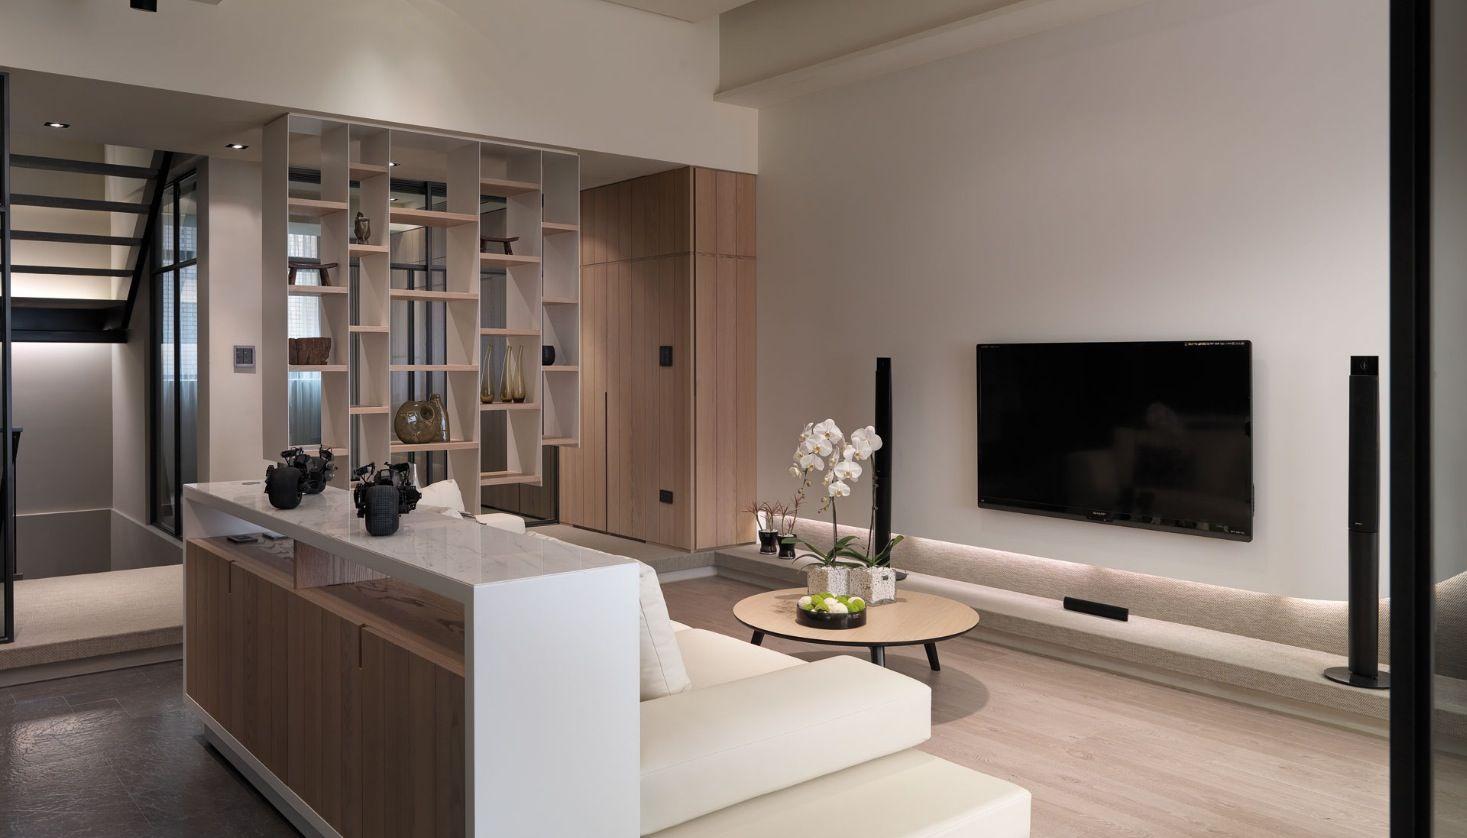 Contemporary Loft Style Apartment Design Makes You Feel Stunning - Cool apartment ideas blending wood black white interior design decor